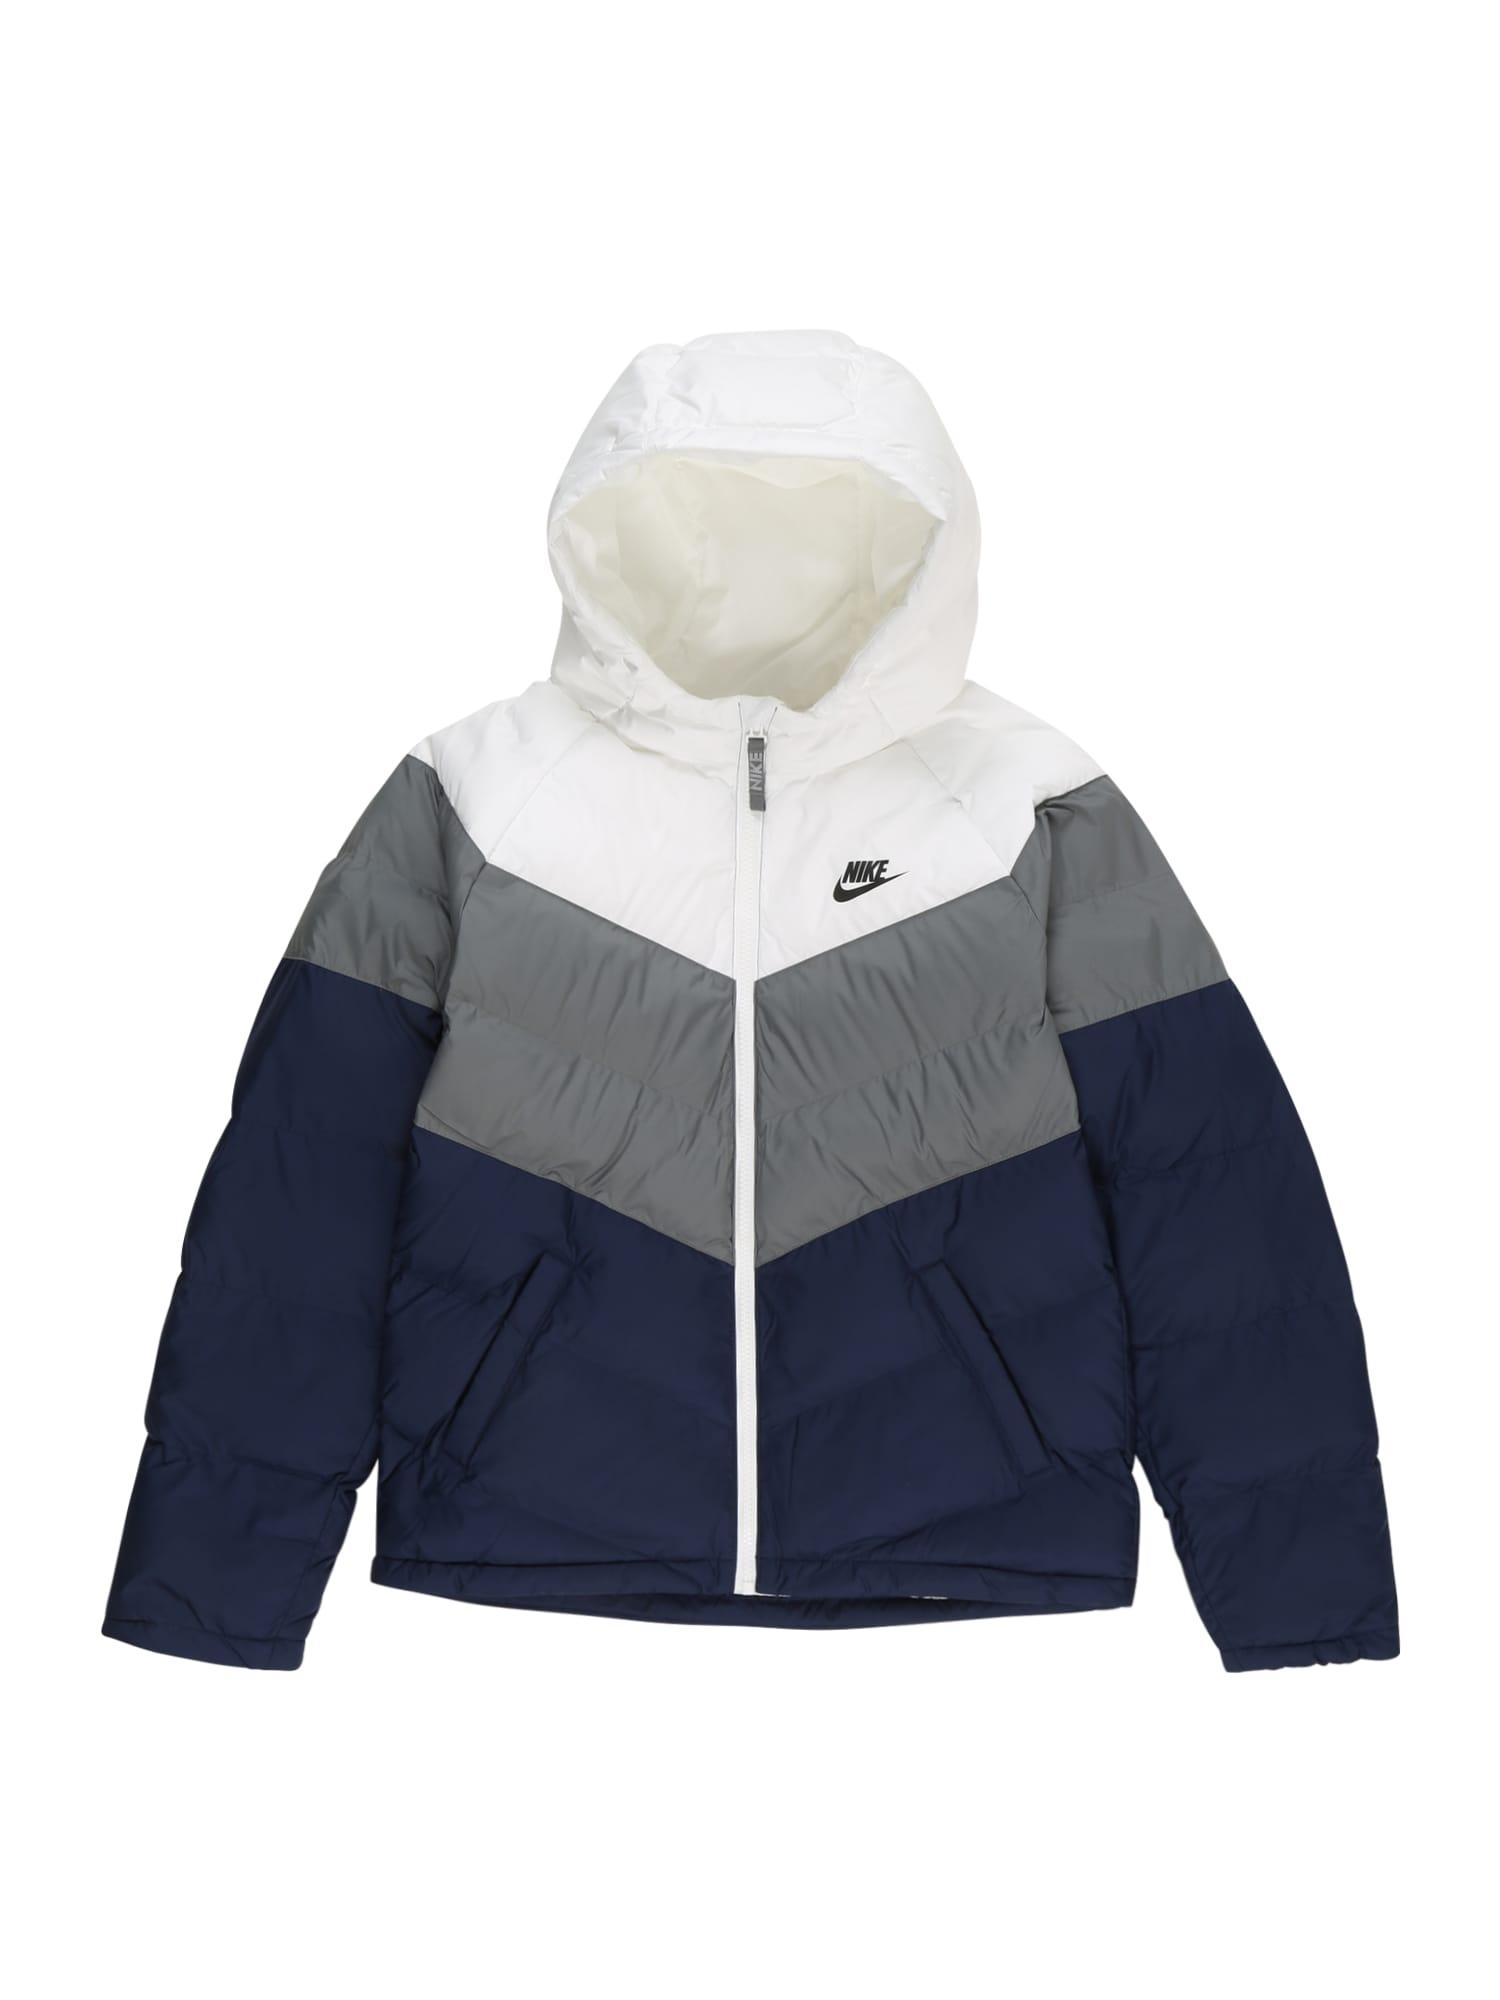 Nike Sportswear Zimní bunda  modrá / bílá / šedá